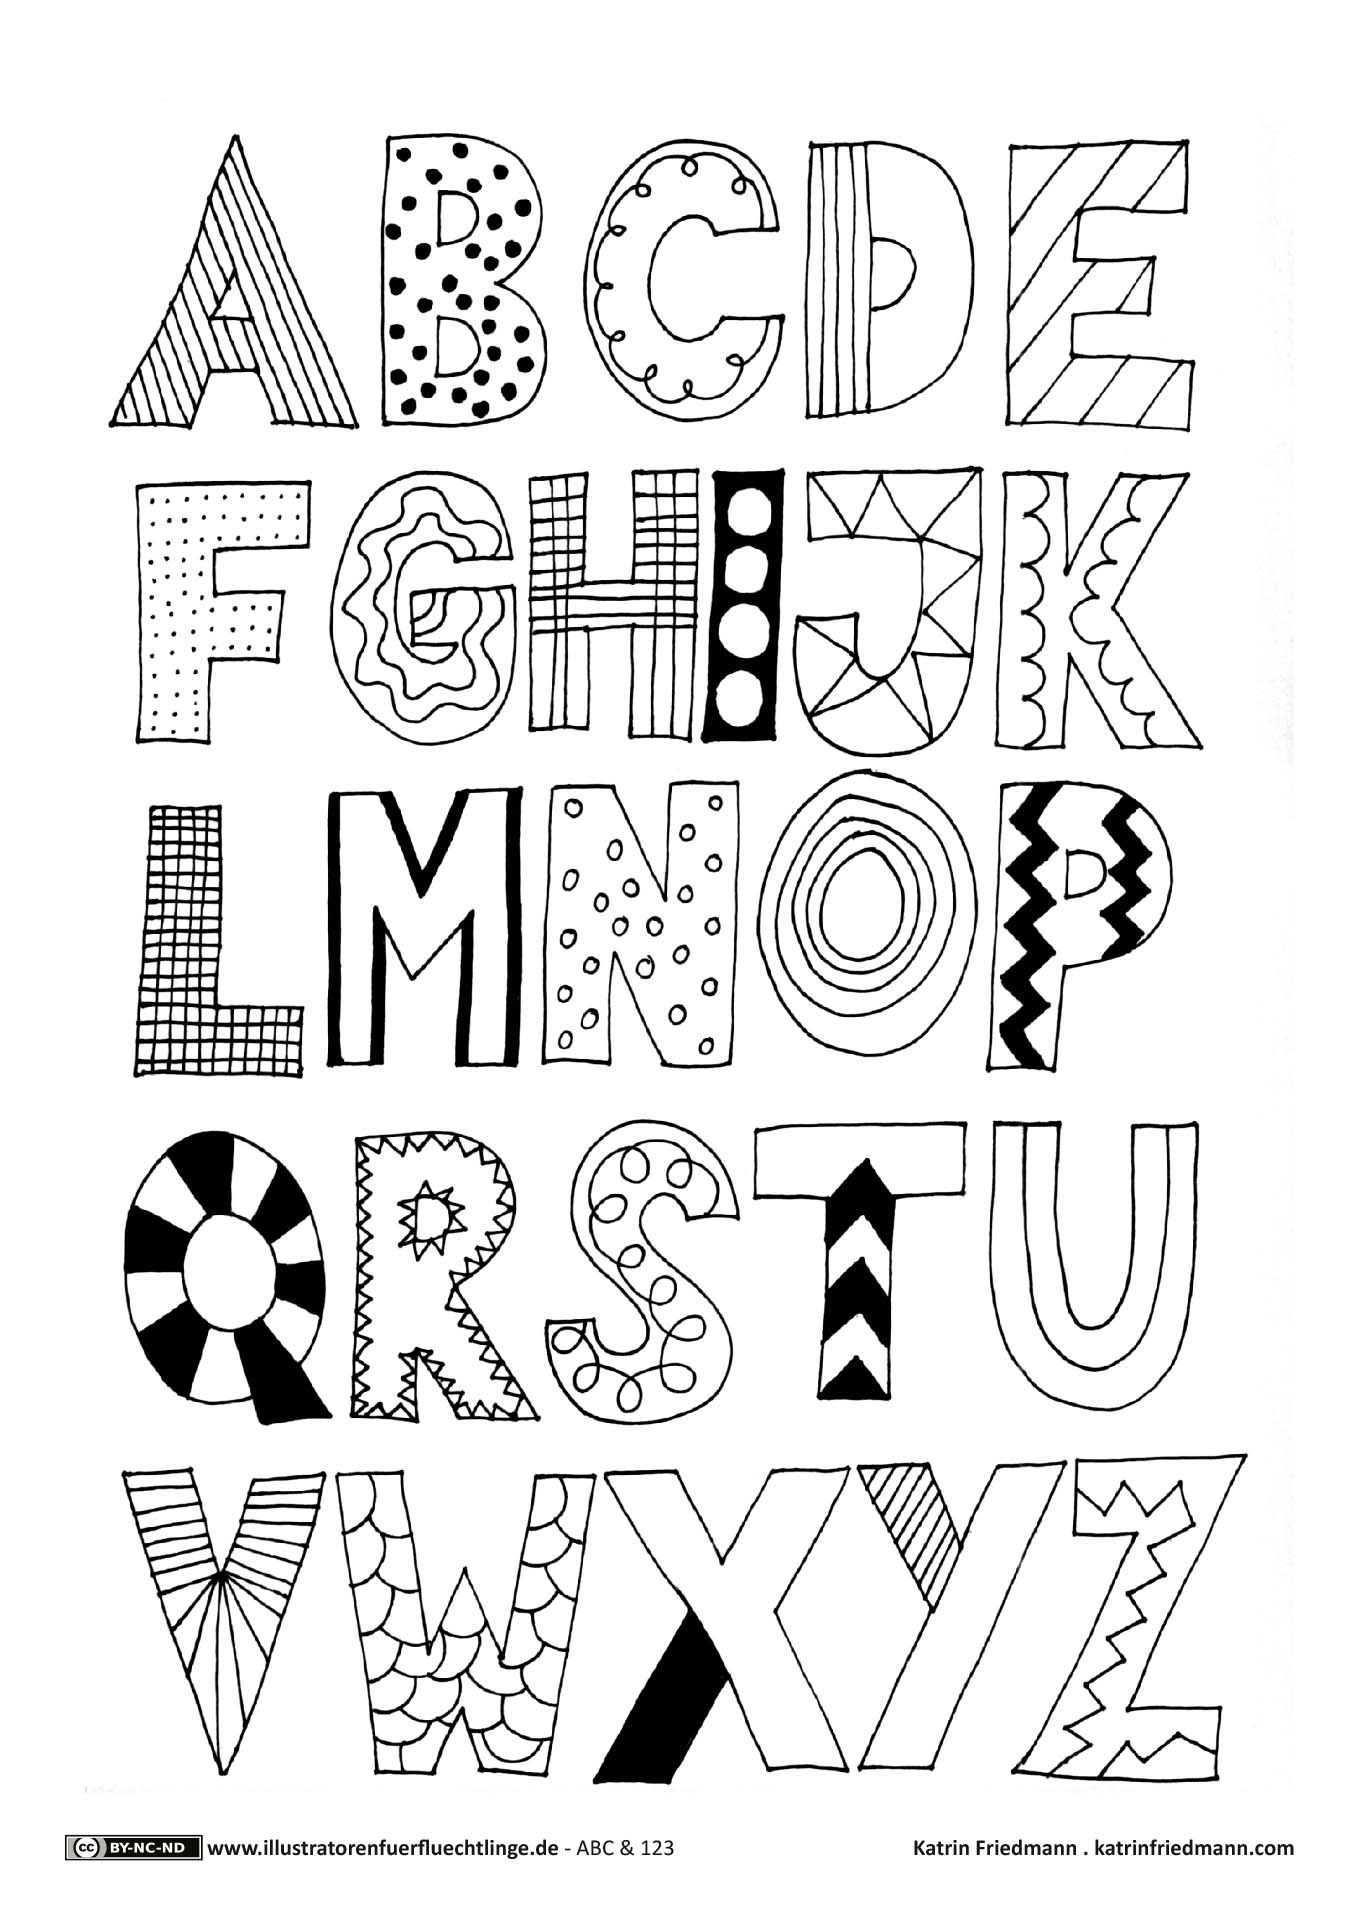 Pin By Heidi May De Leon On Alphabet Doodle Lettering Hand Lettering Alphabet Lettering Alphabet